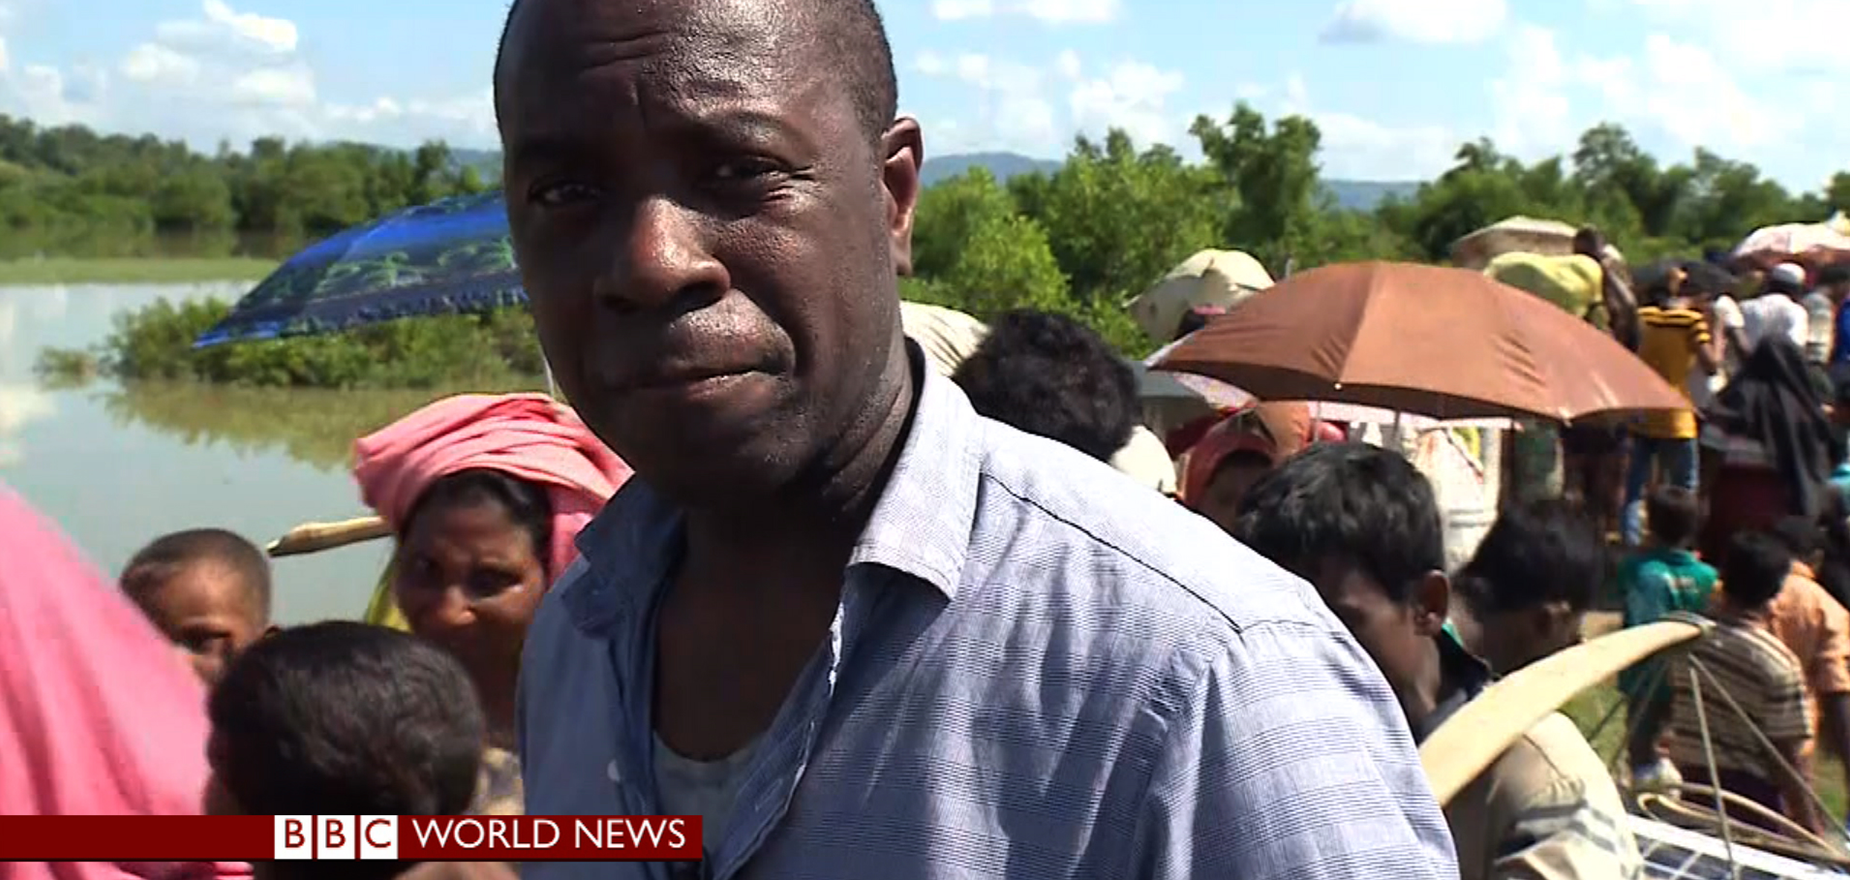 Plight of Rohingya Refugees - BBC News